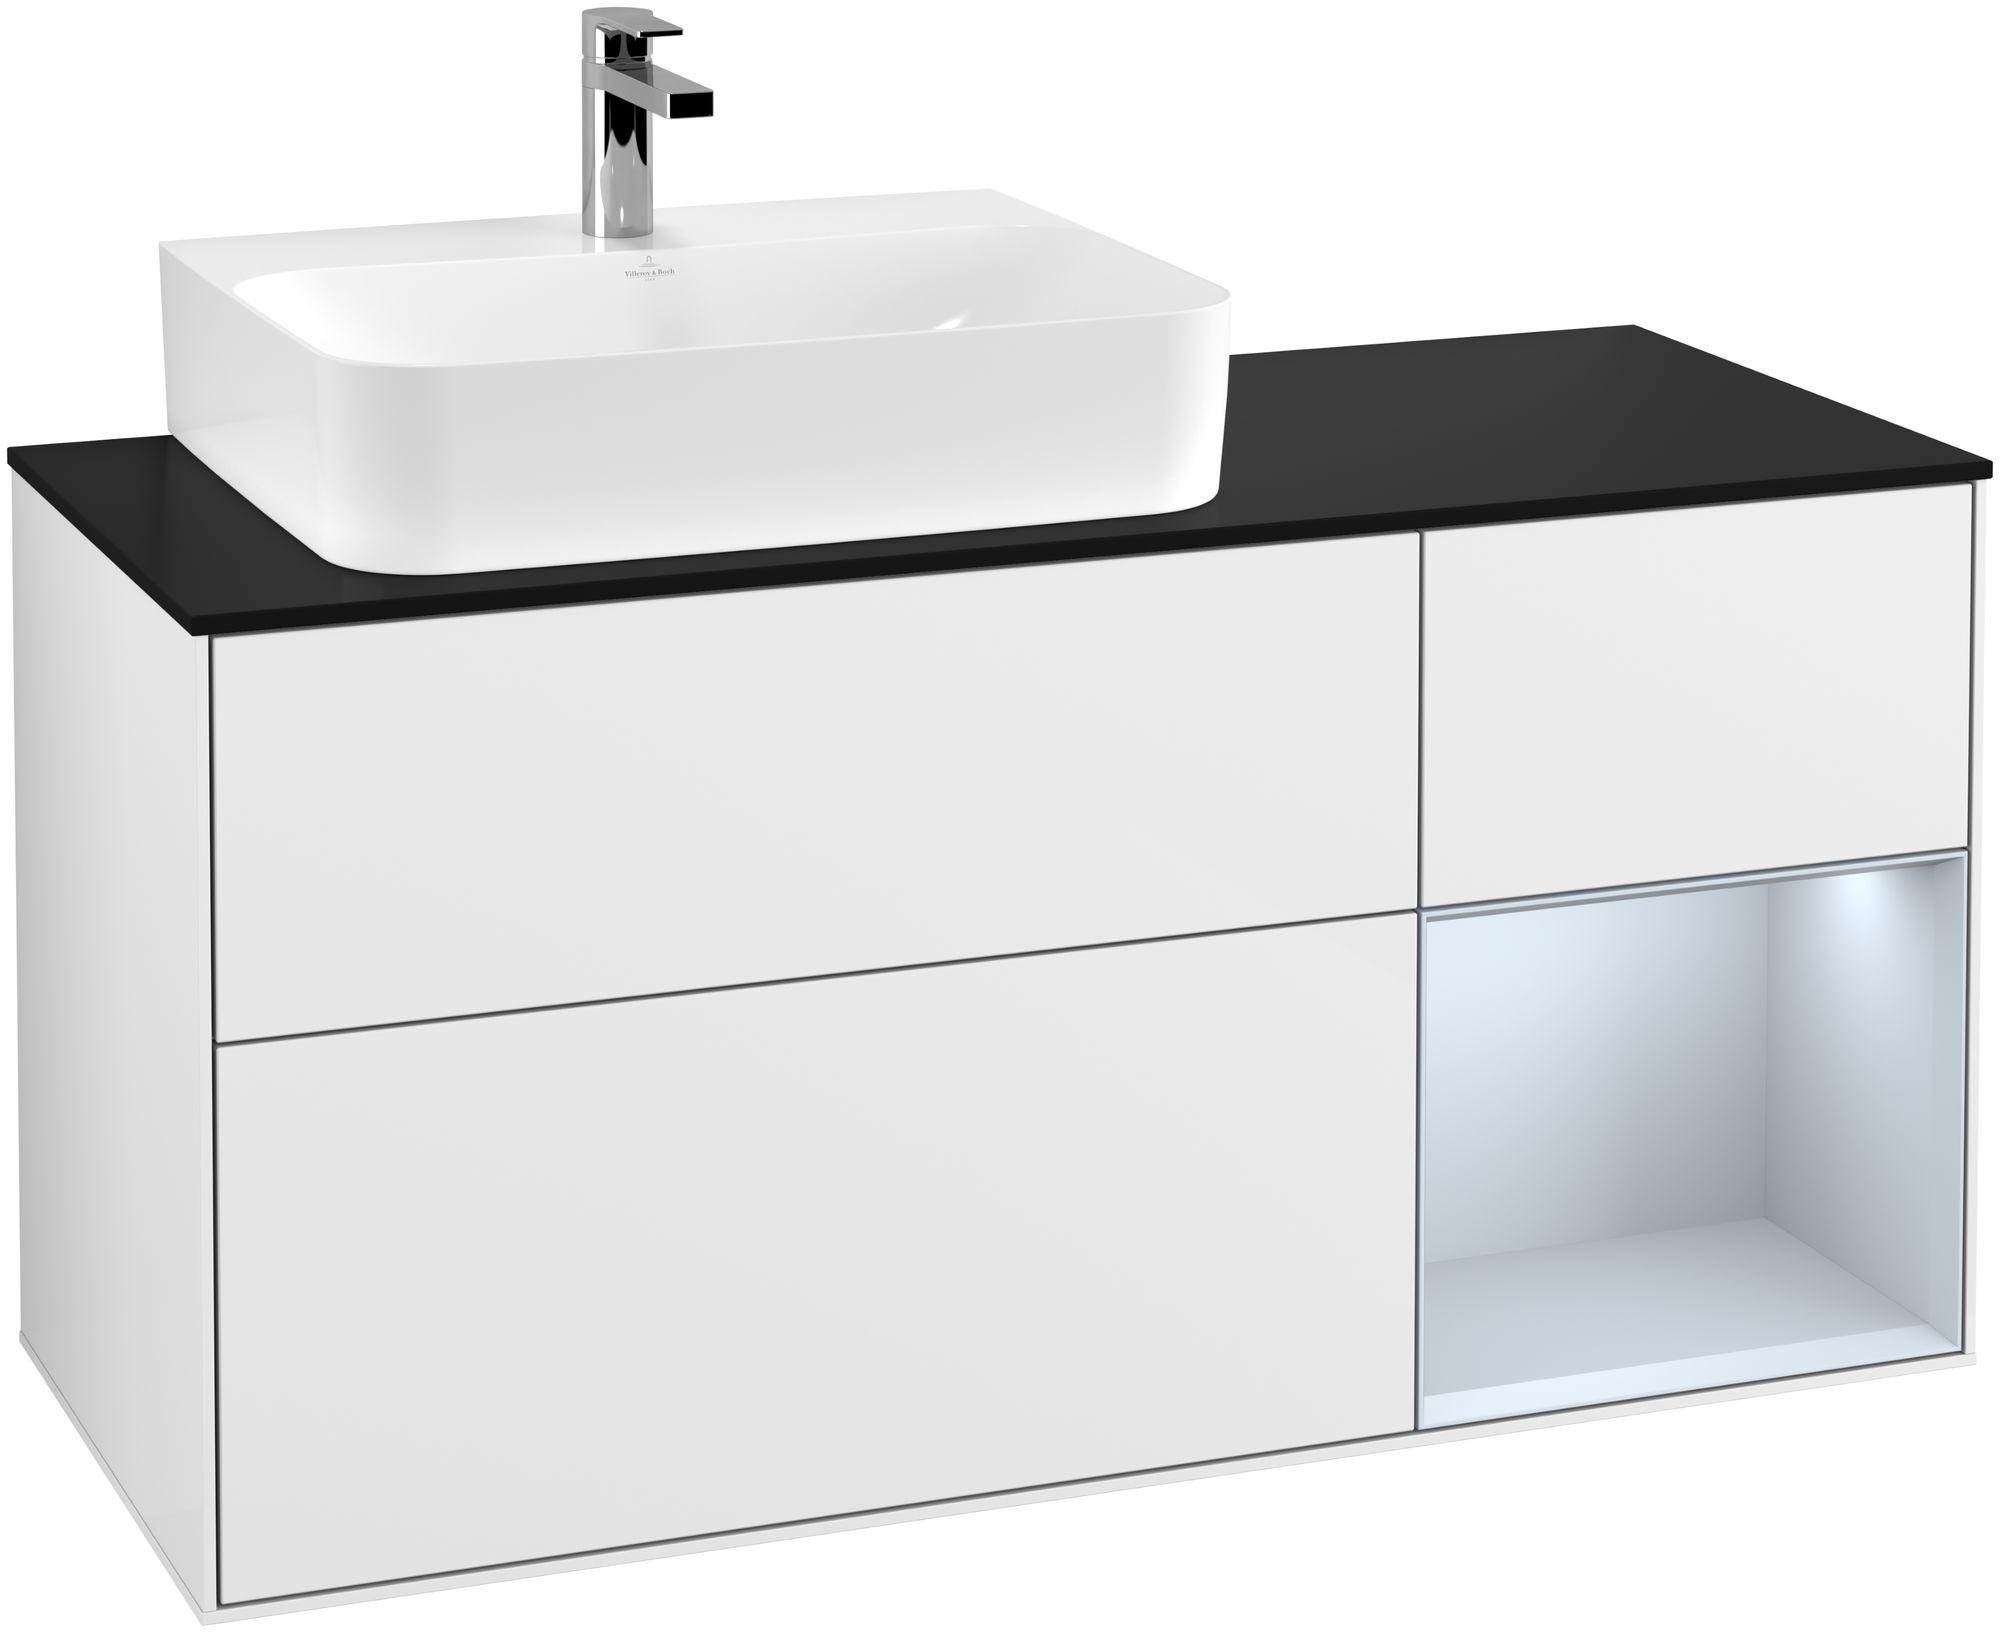 Villeroy & Boch Finion G15 Waschtischunterschrank mit Regalelement 3 Auszüge Waschtisch links LED-Beleuchtung B:120xH:60,3xT:50,1cm Front, Korpus: Glossy White Lack, Regal: Cloud, Glasplatte: Black Matt G152HAGF